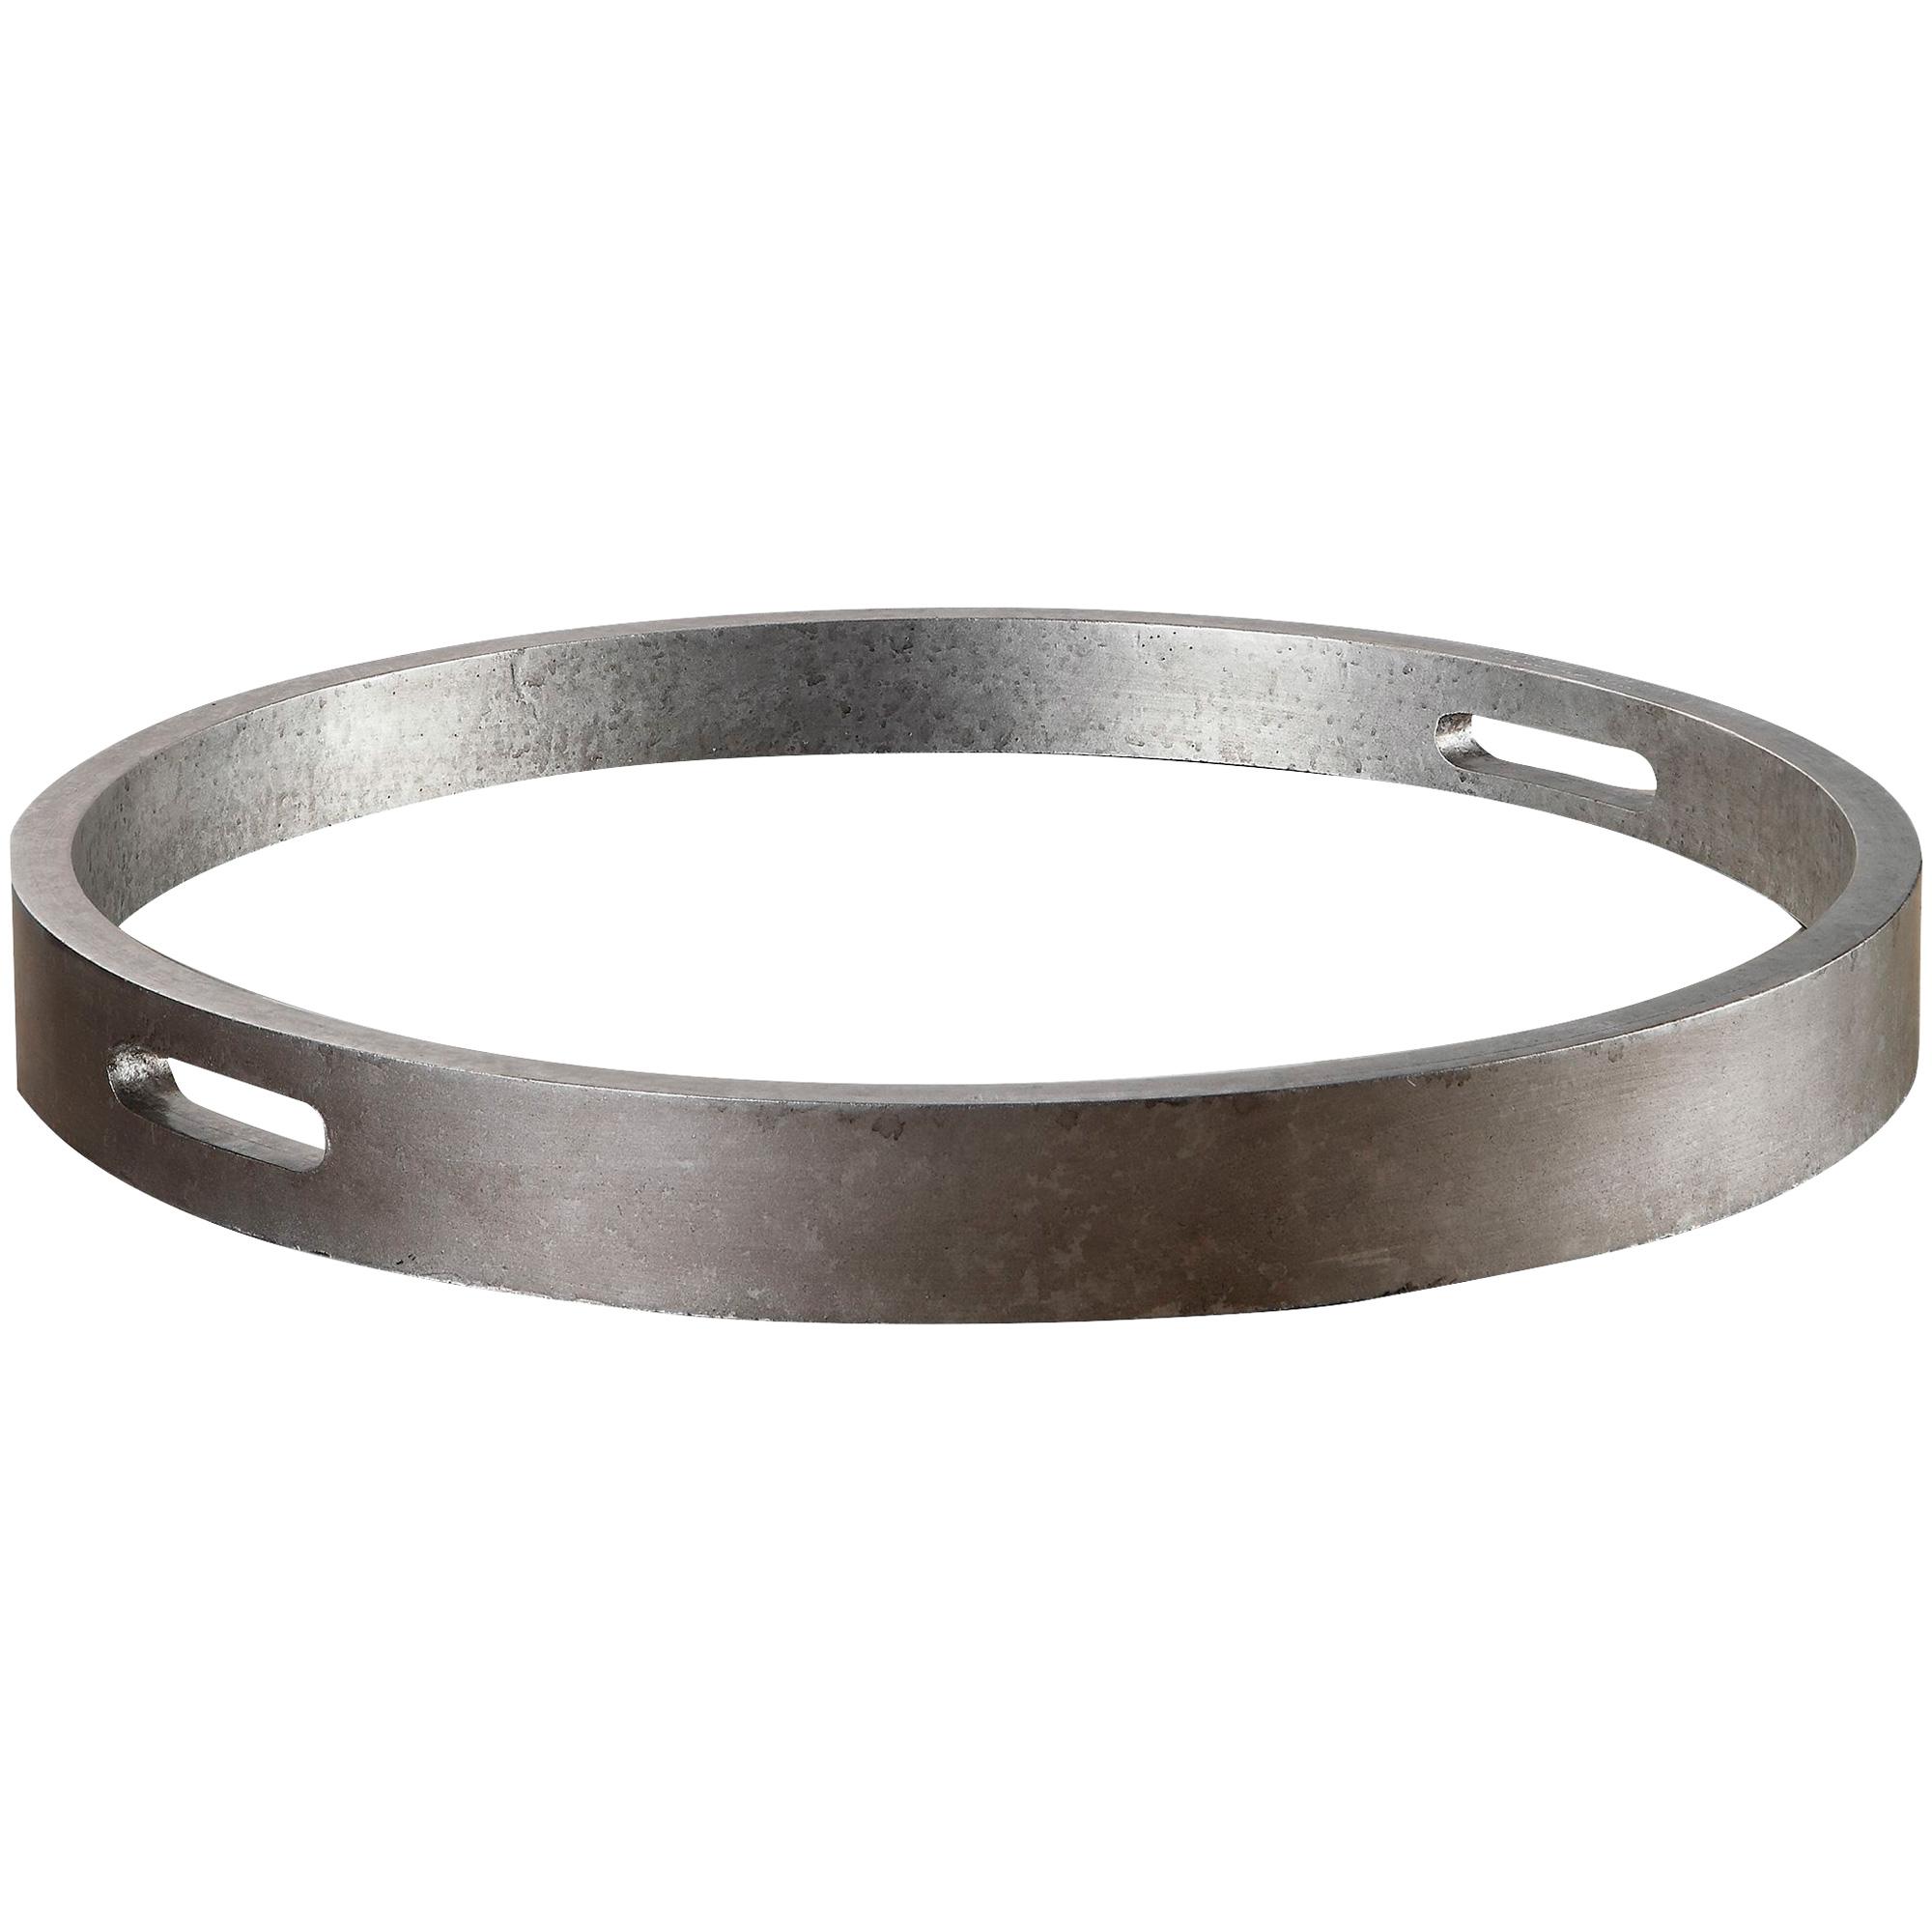 Uttermost | Bechet Round Silver Tray